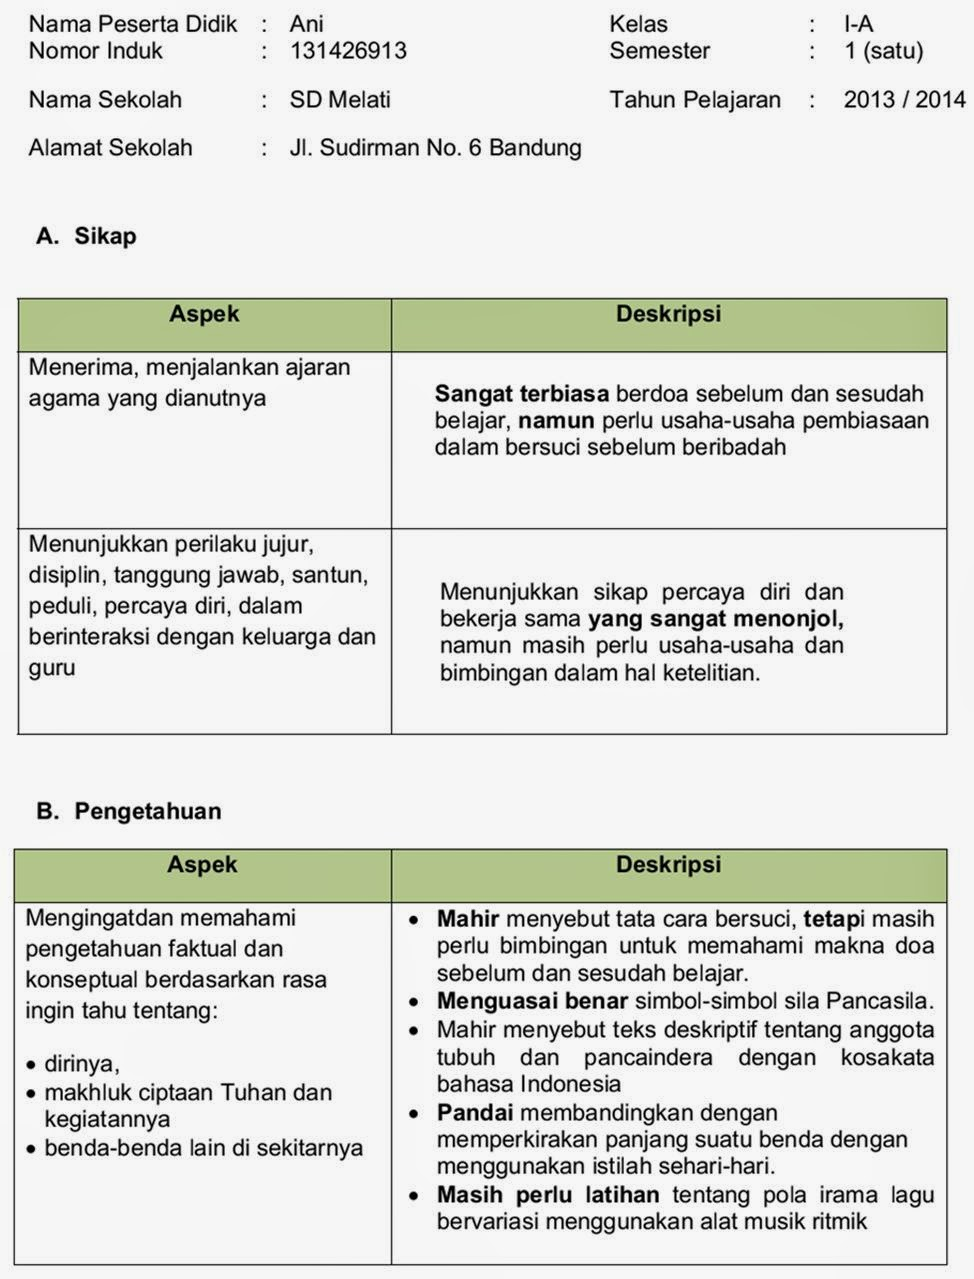 Pesan Guru Di Raport : pesan, raport, Contoh, Catatan, Raport, IlmuSosial.id